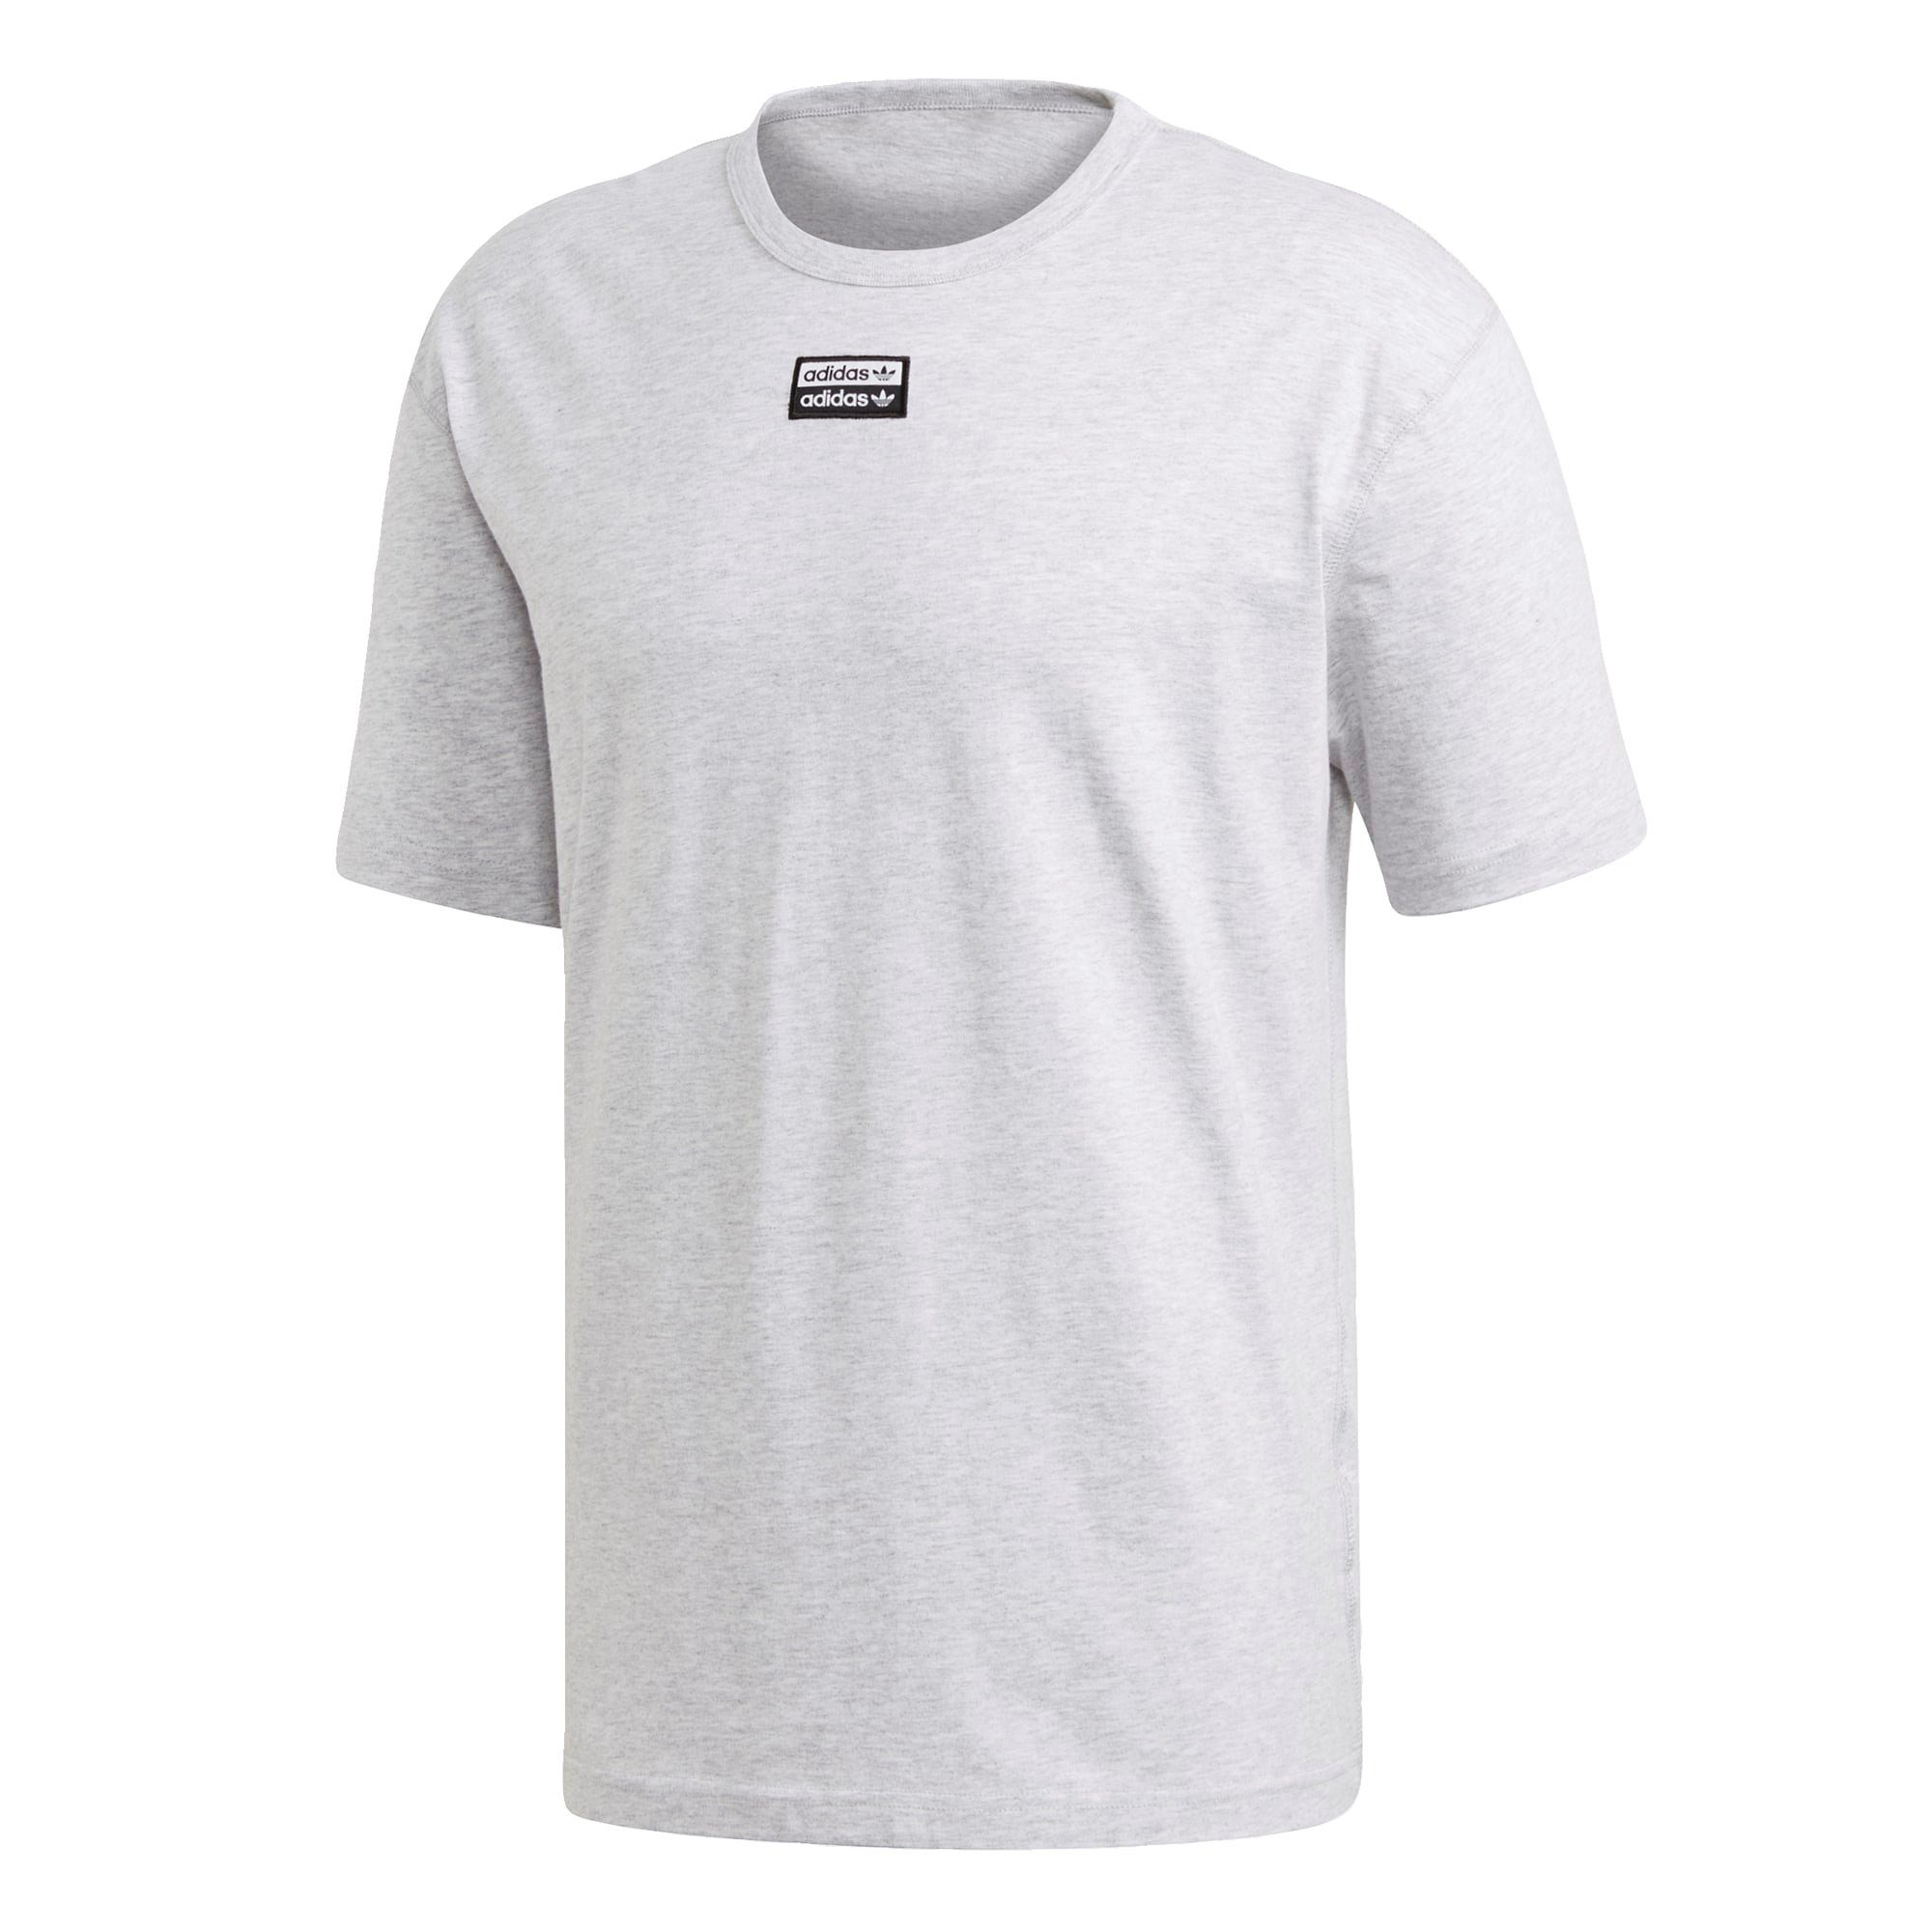 adidas Originals T Shirt »T Shirt« Ryv, Kurzärmelig online kaufen | OTTO